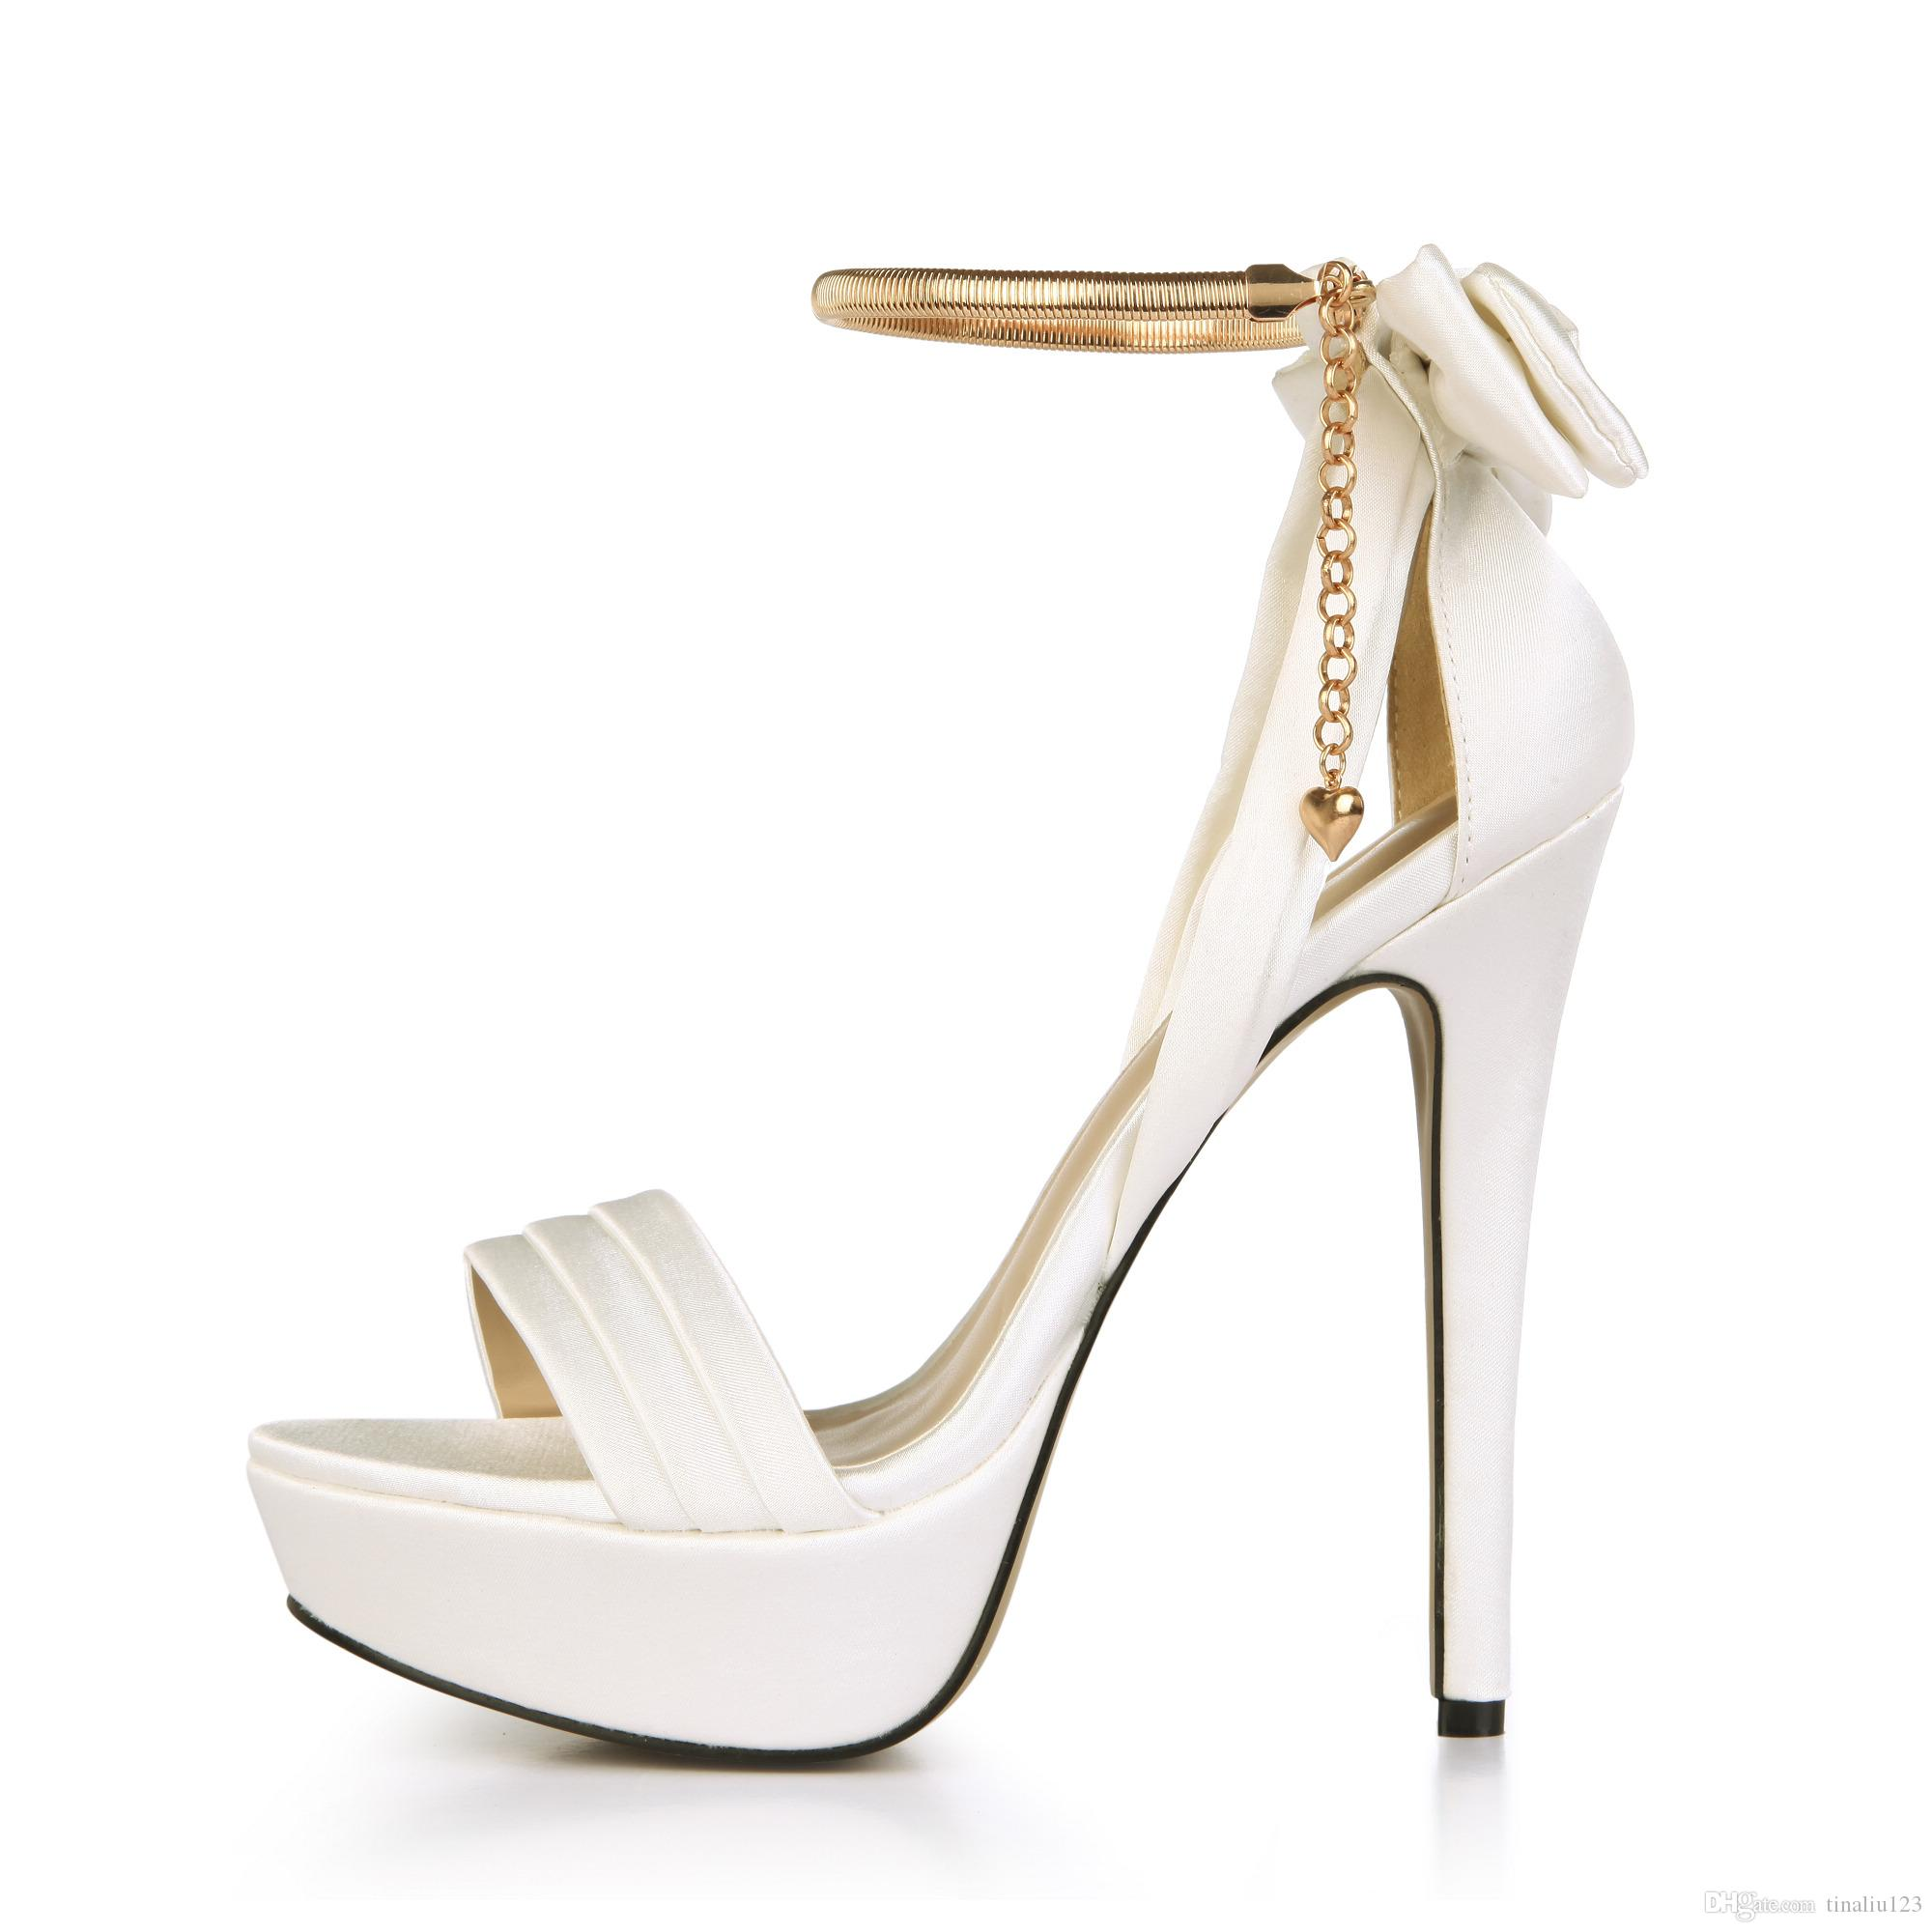 0cd89eef0205 New Elegant Women High Heel Platform Sandals Fashion Bow Thin Heels  Sandalias High Quality Satin Party Wedding Dress Shoes Mujer Sandalias Boys  Sandals ...